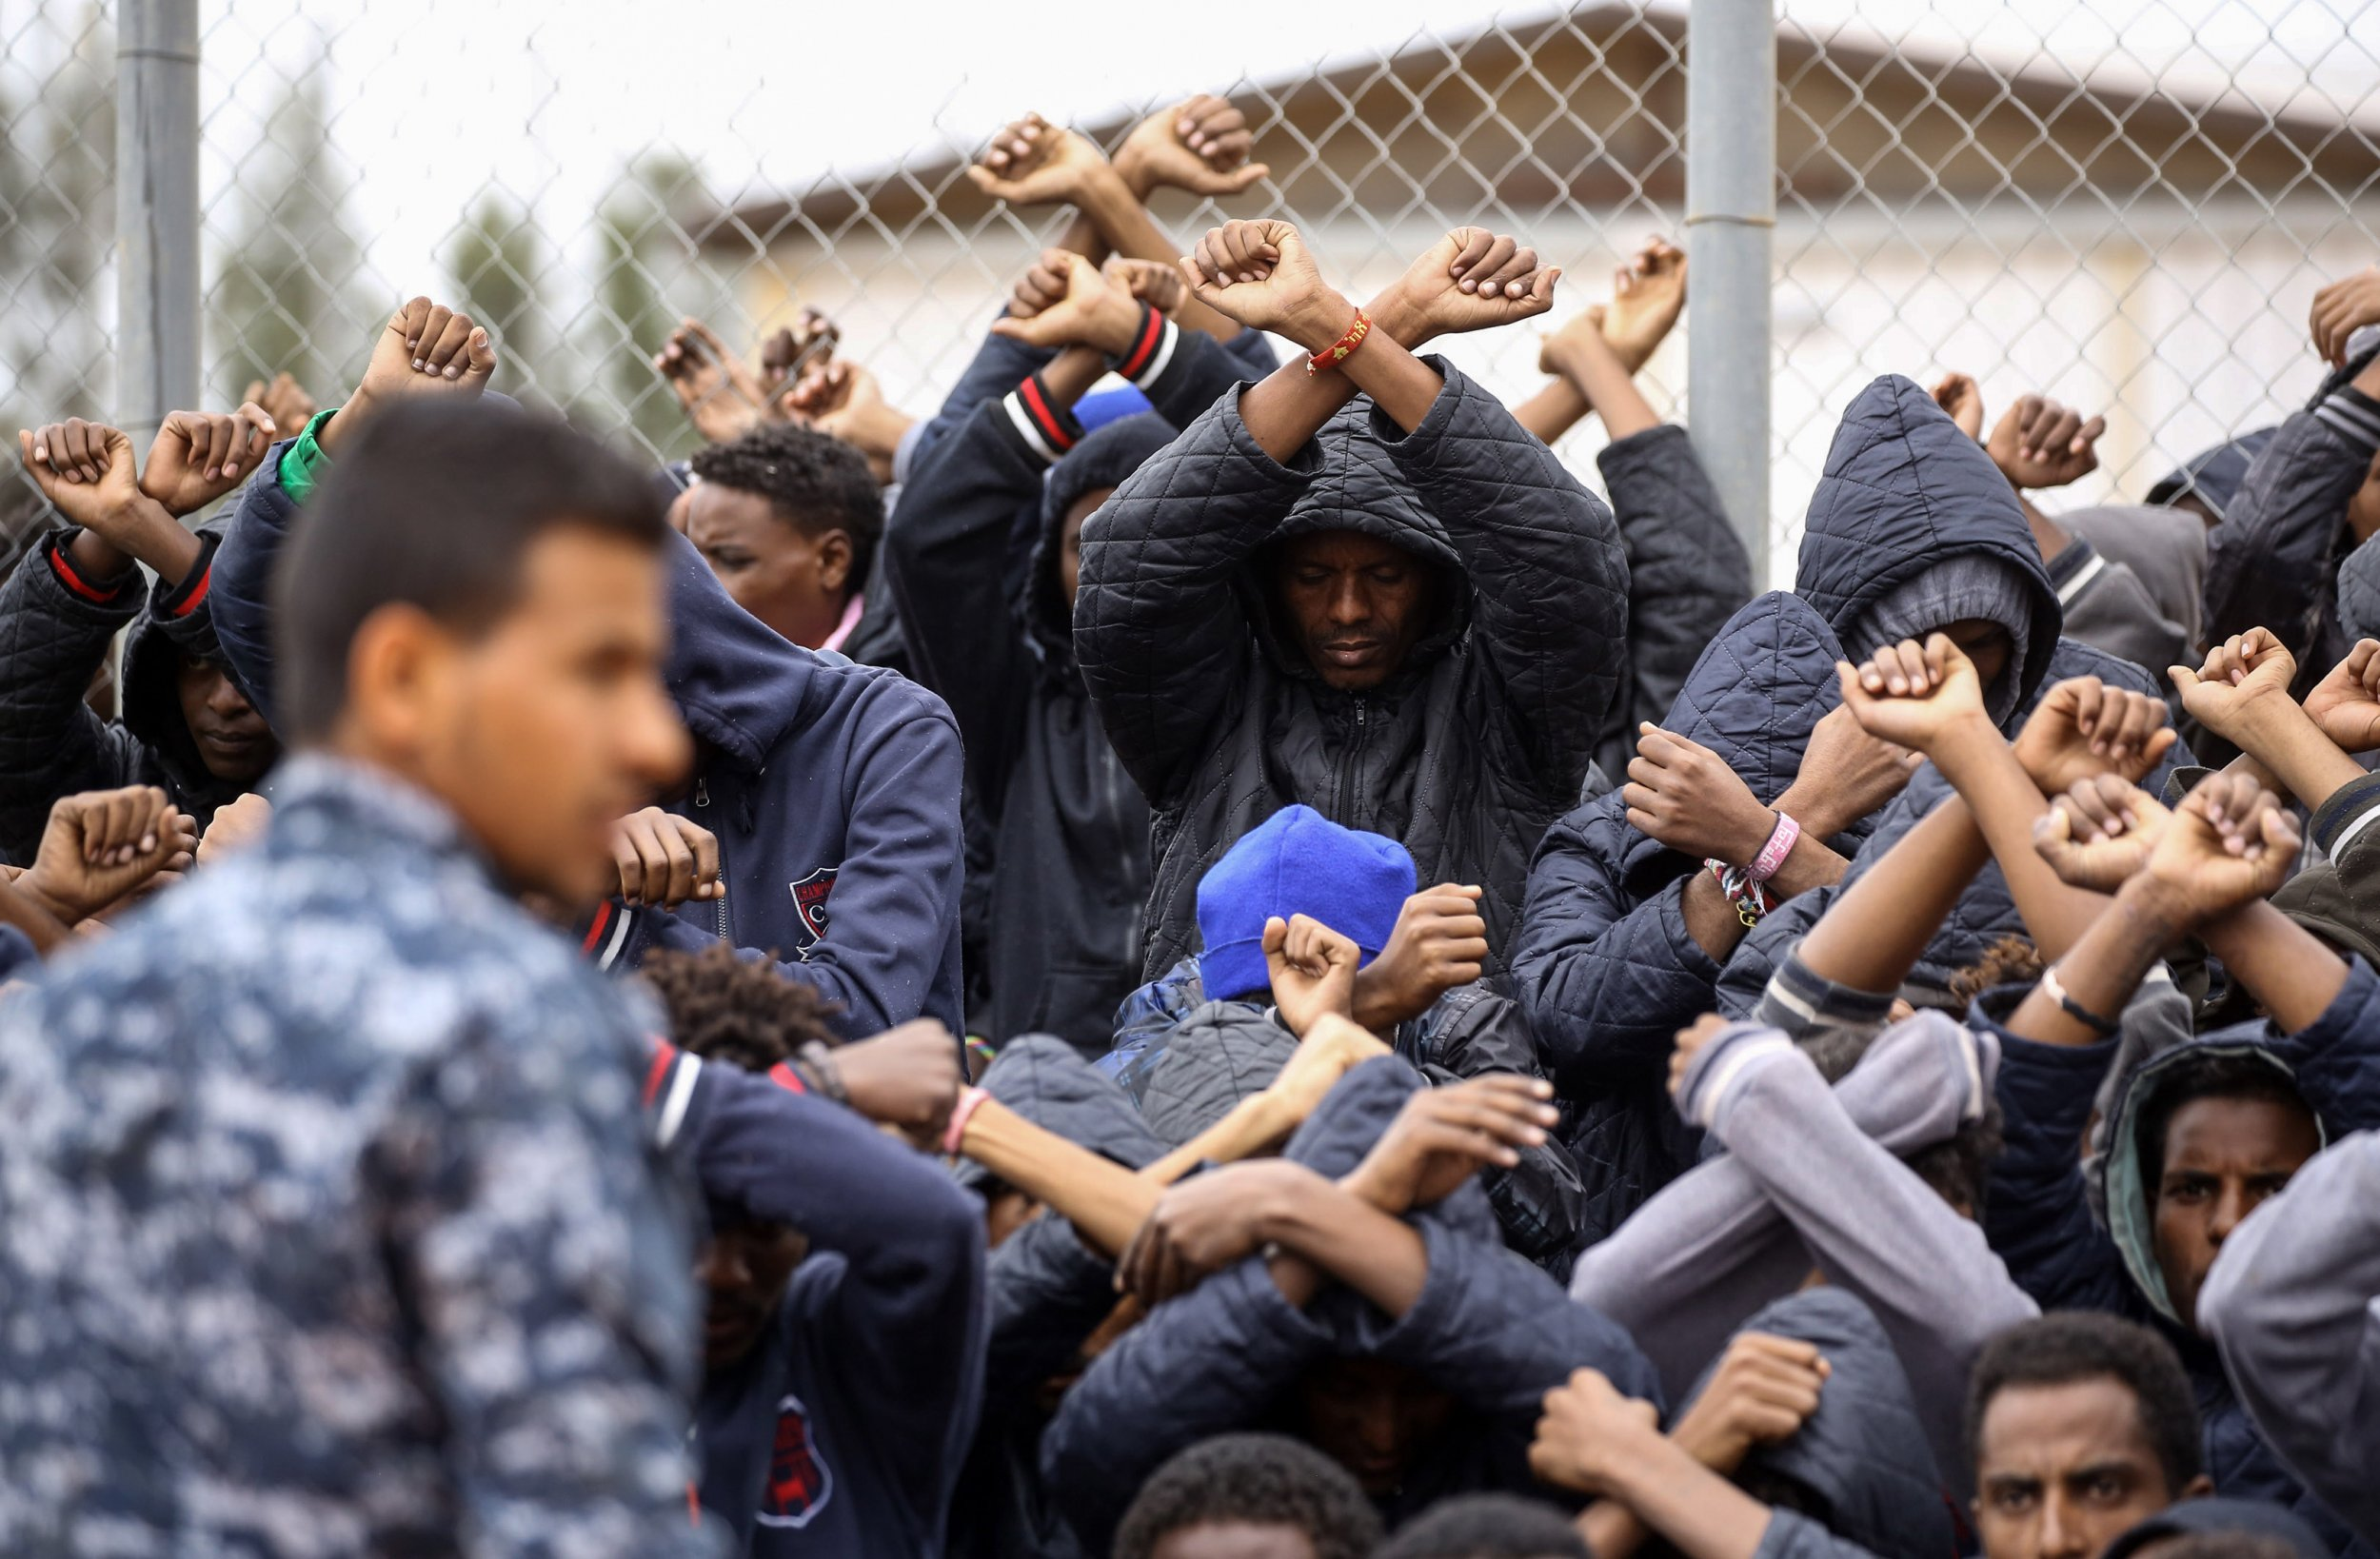 Libya migrants protest detention